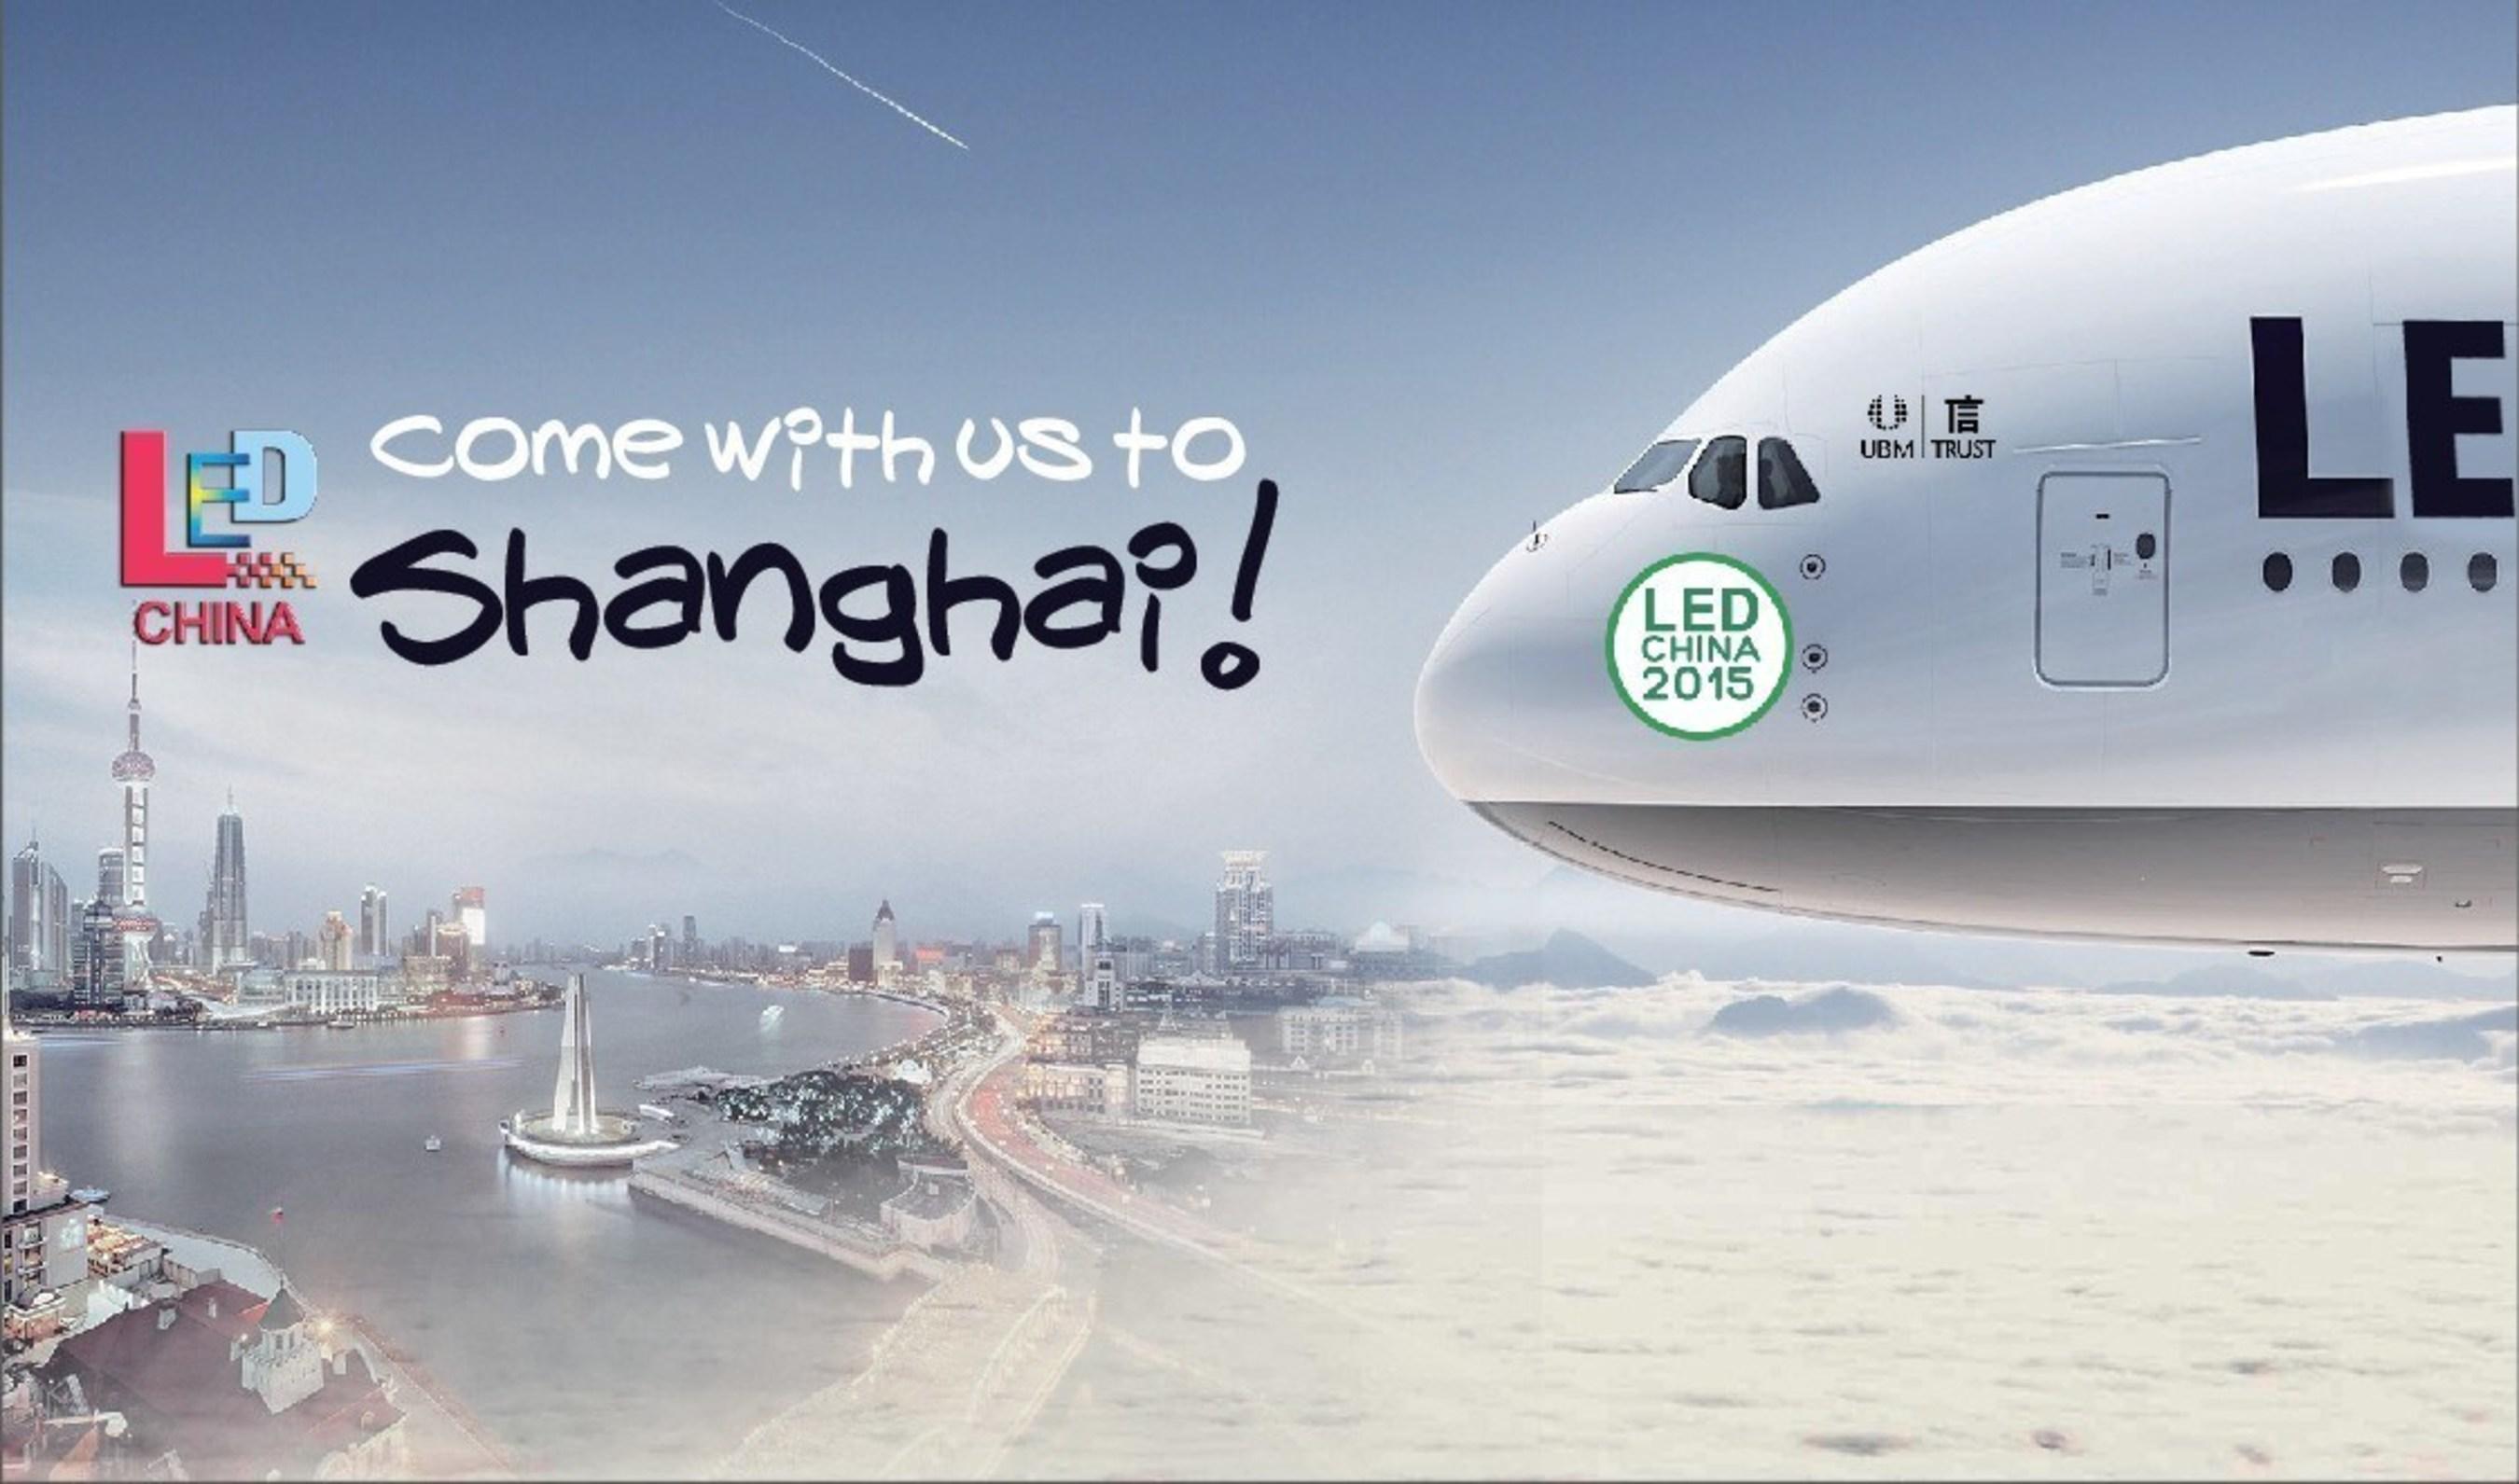 LED CHINA and LED LIGHTING CHINA 2015 Relocates to Shanghai